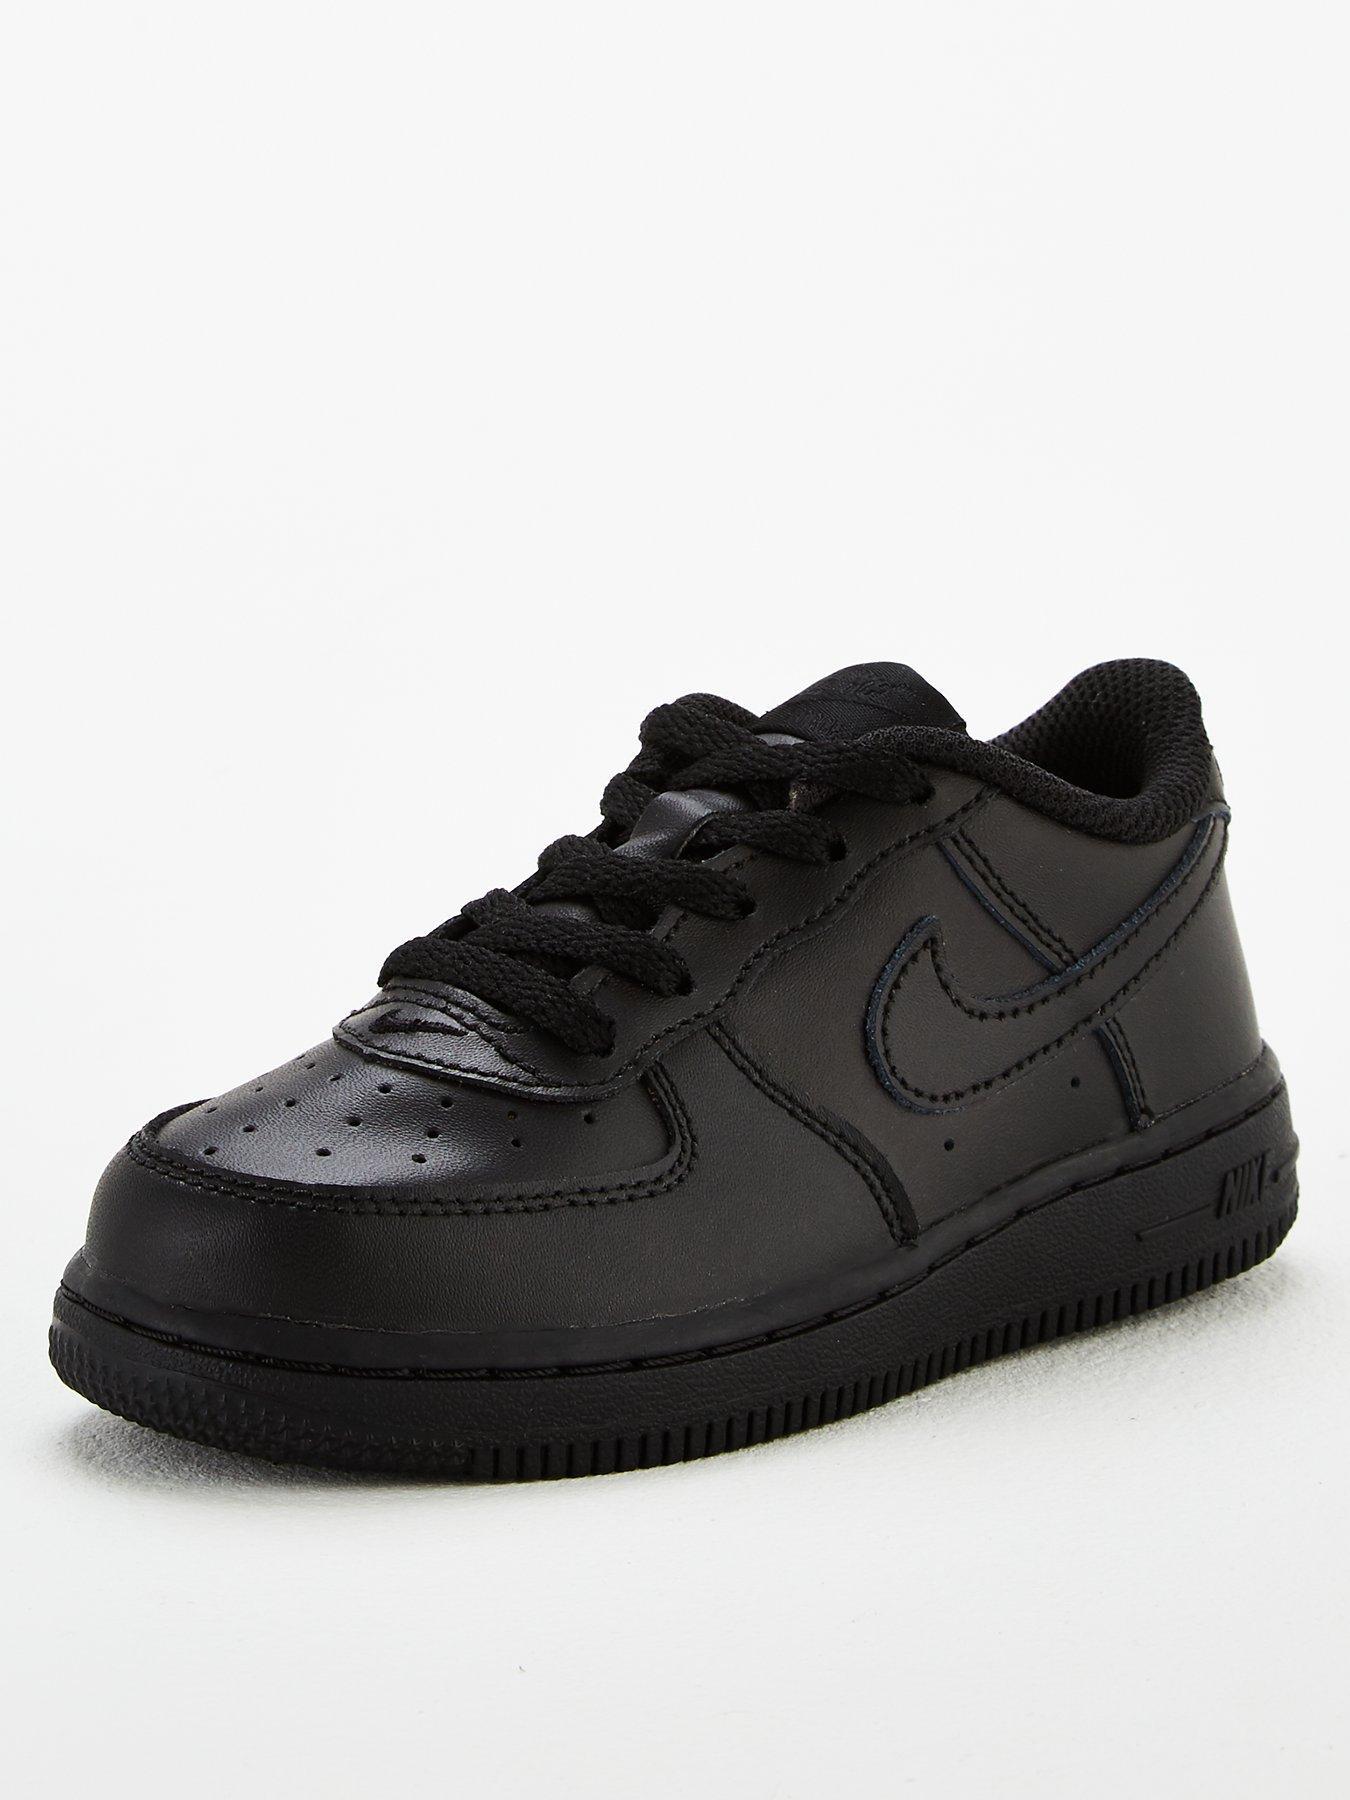 Kids Air Force 1 | Kids Nike Air Force